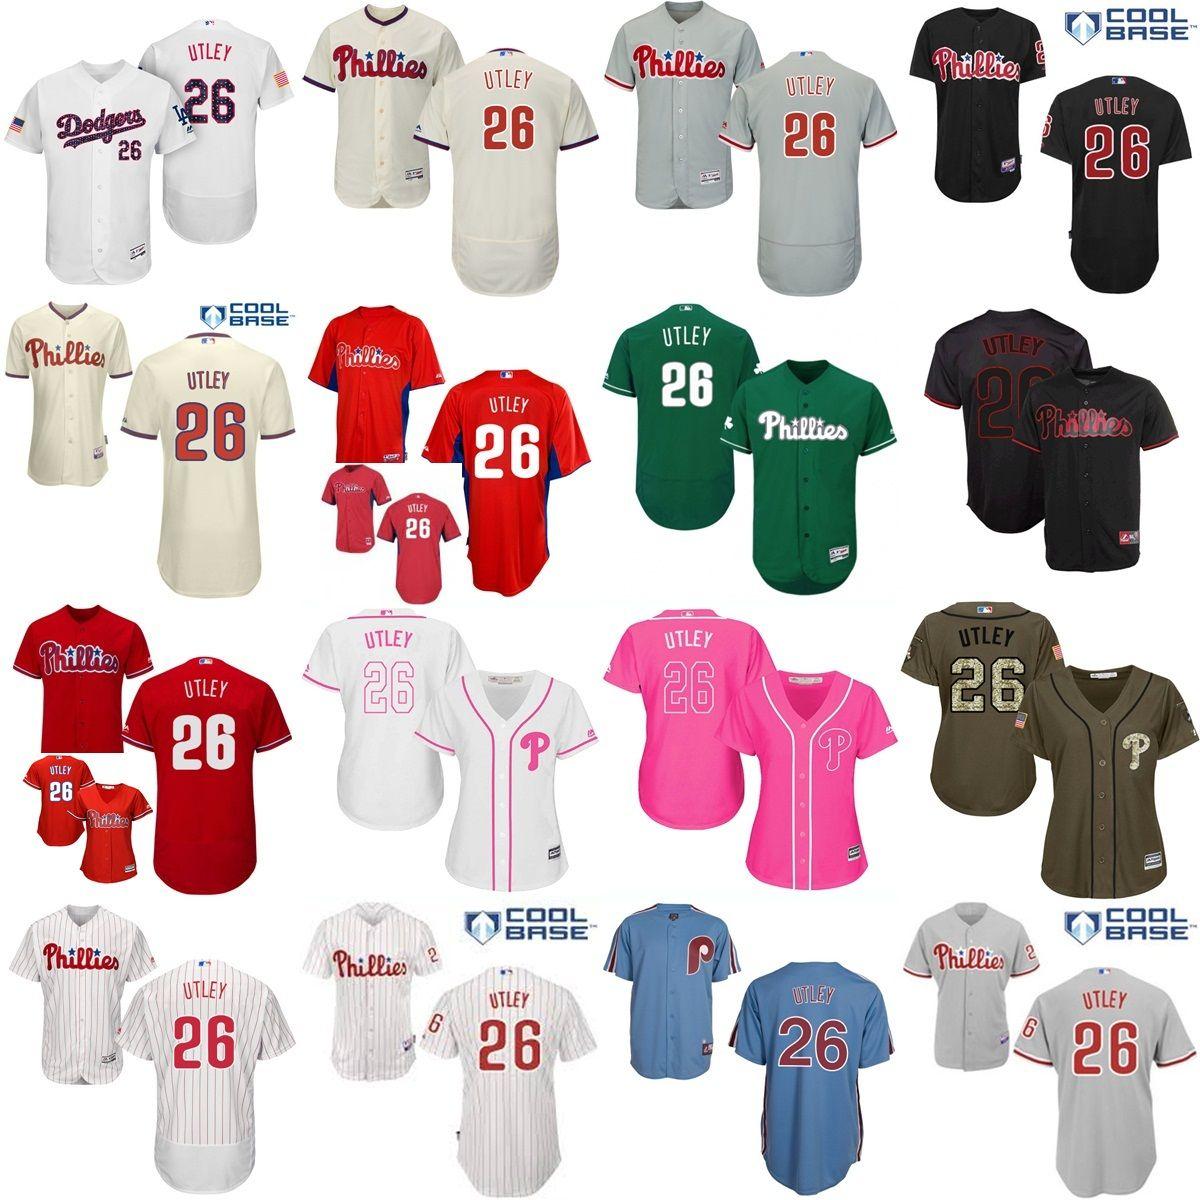 ... Cool Base MLB Jersey 2017 Authentic Baseball Jerseys MLB Youth Kids Mens  Womens Philadelphia Phillies 26 Chase Utley Grey Flex Chase Utley White ... fc3d5ee62